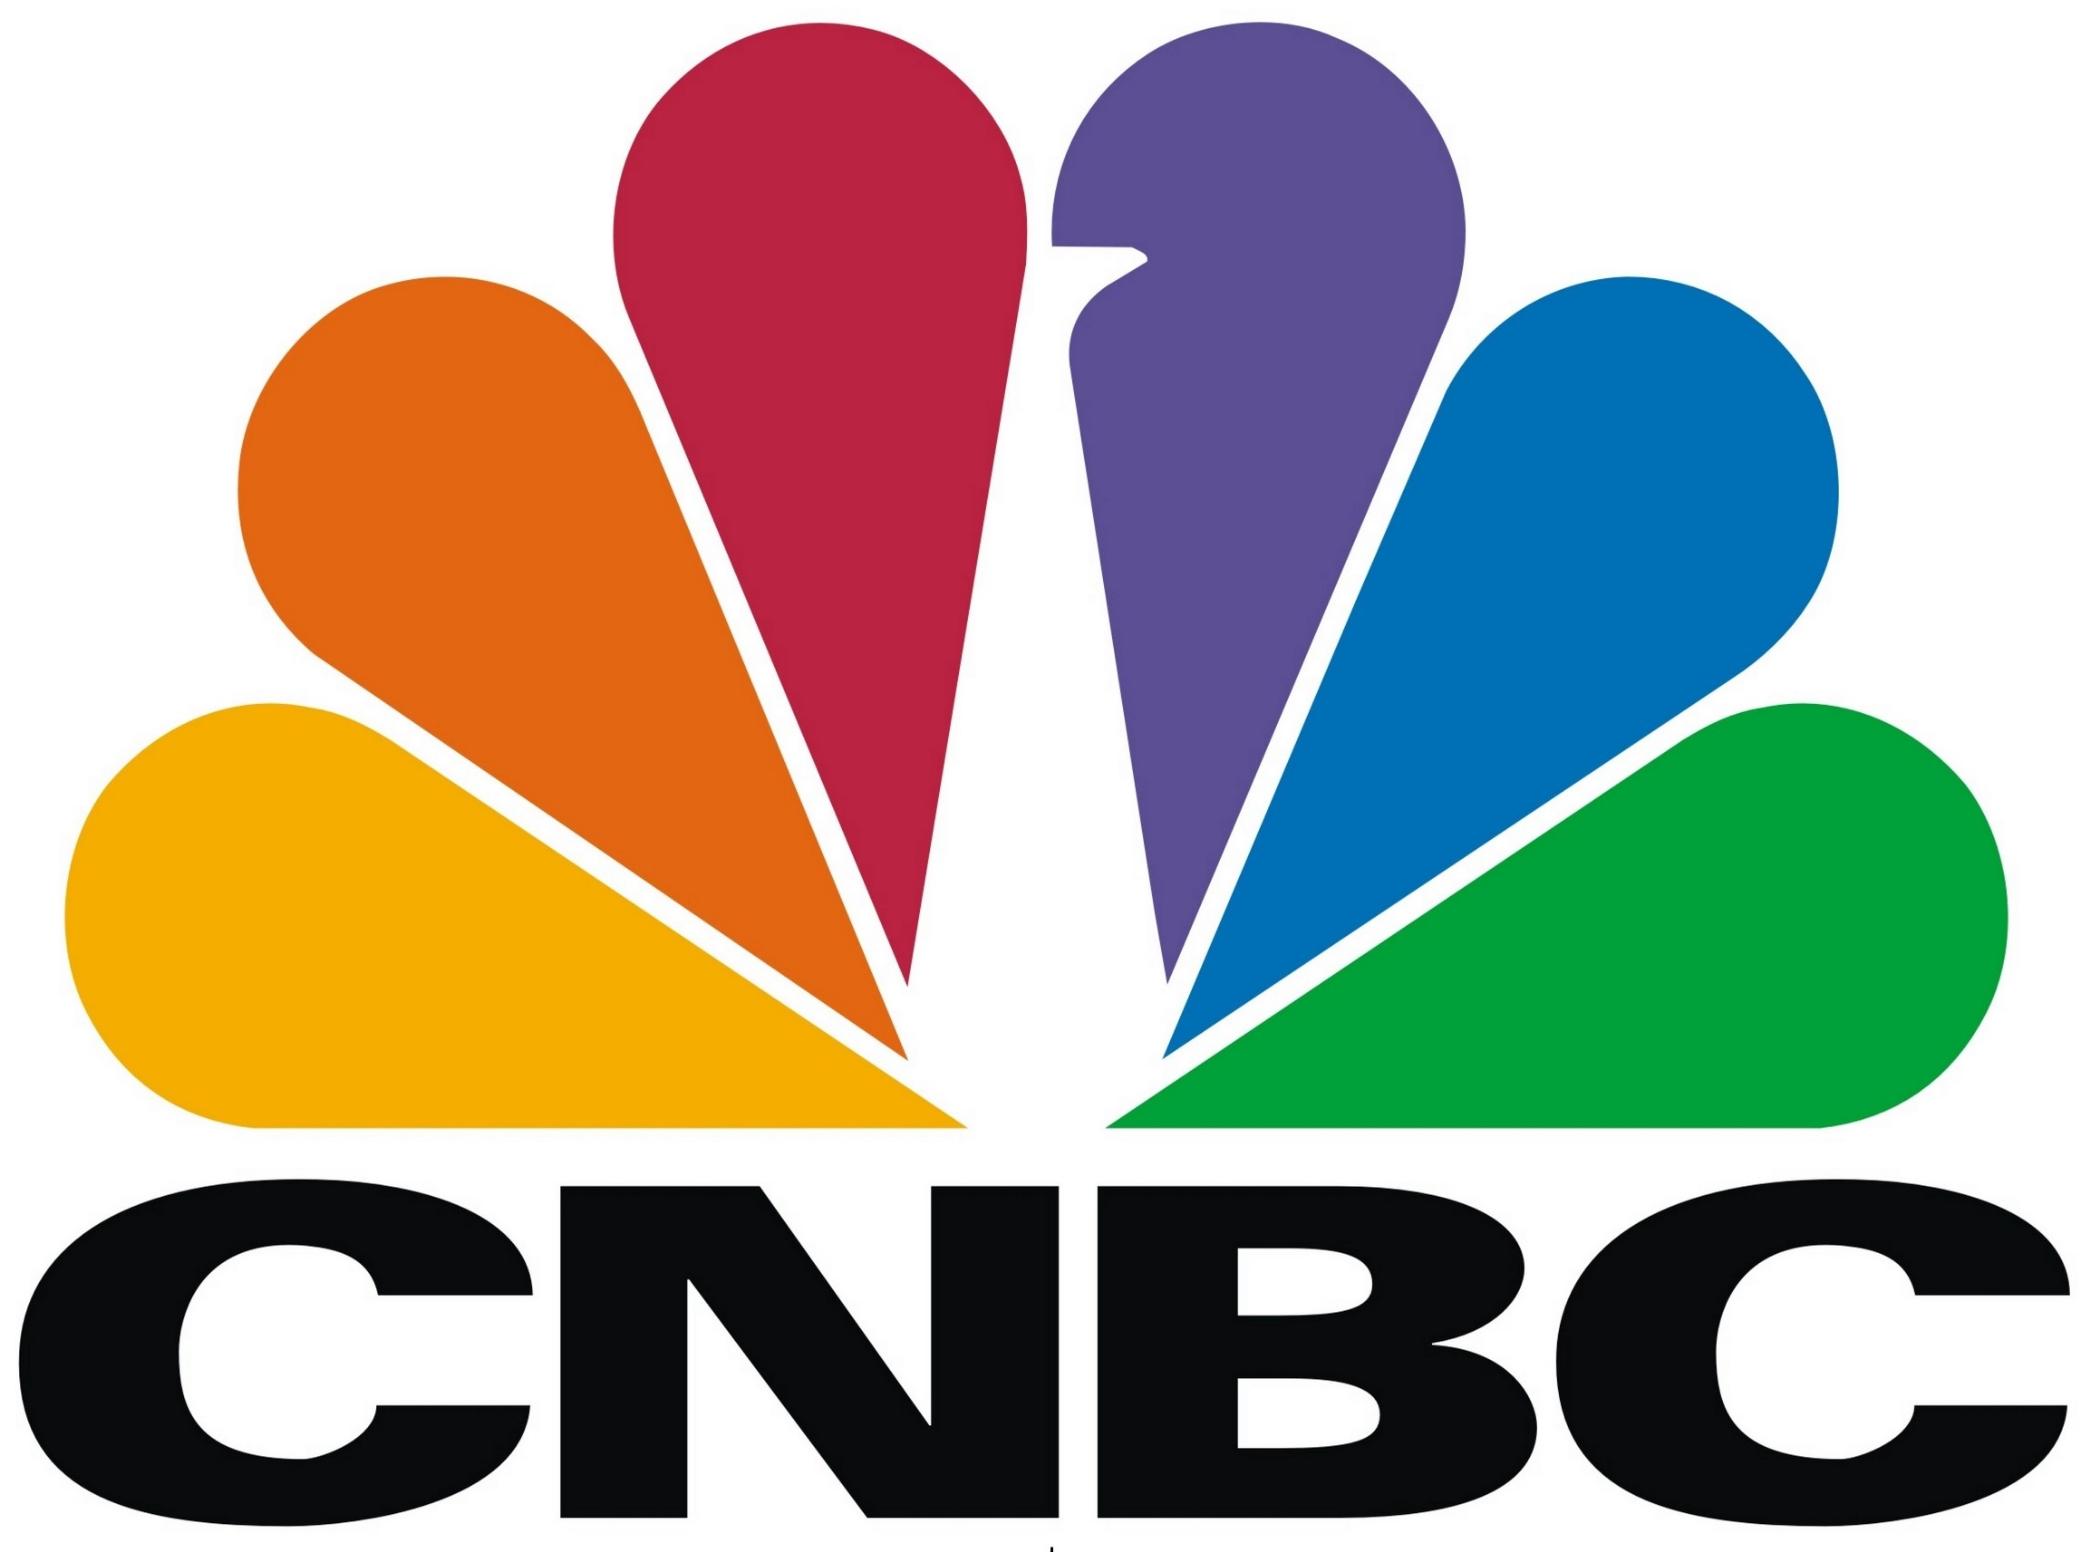 cnbc_logo.jpg